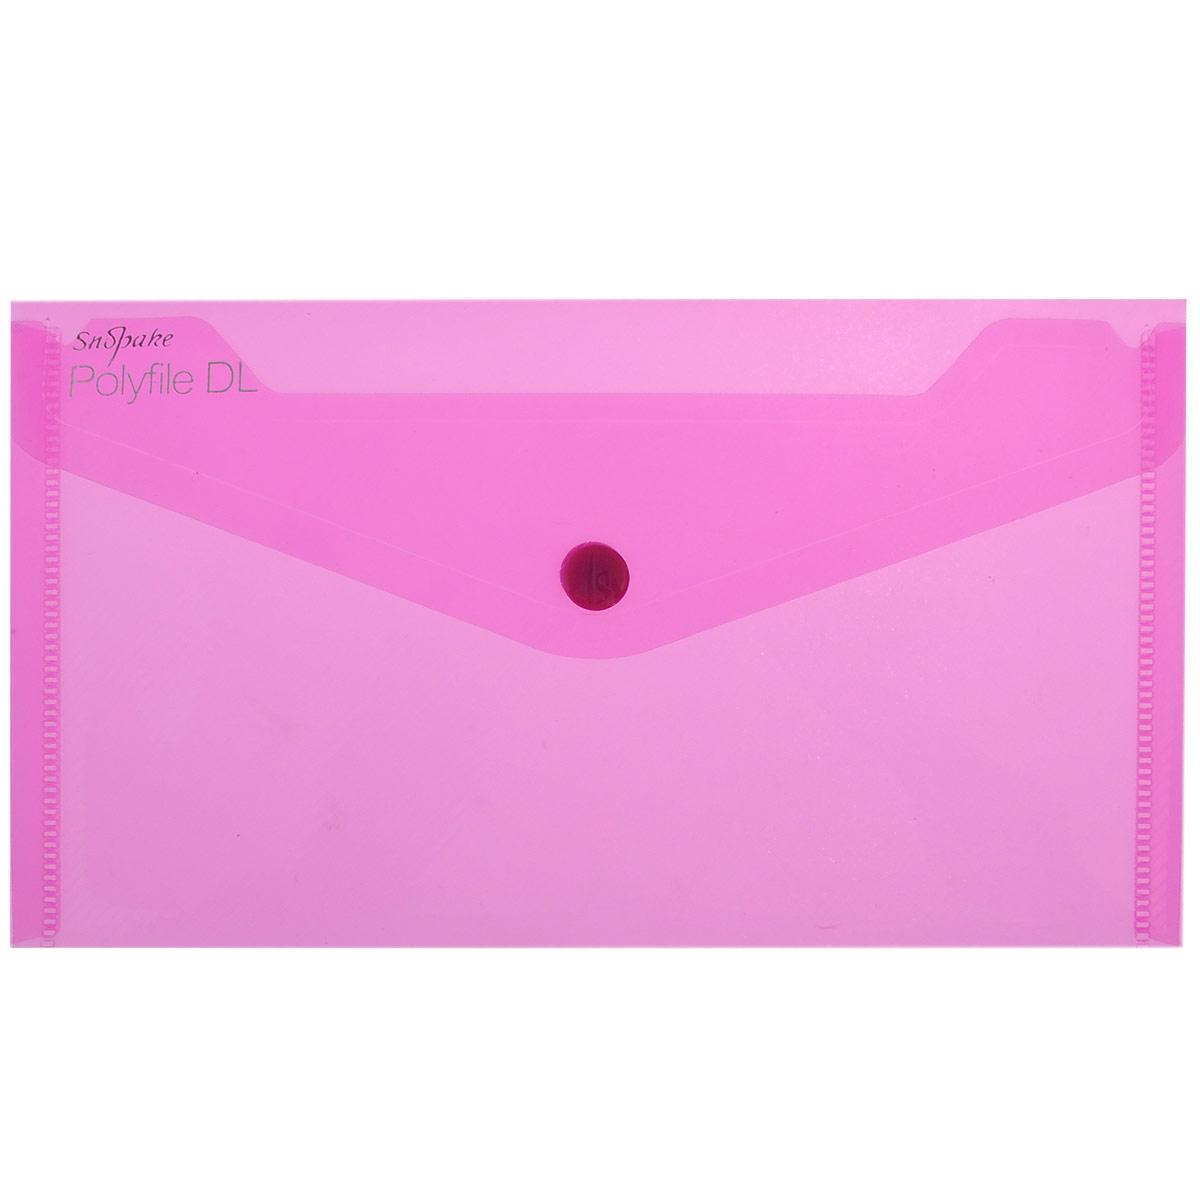 Папка-конверт на кнопке Snopake Polifile DL: Electra, цвет: розовый, формат А5K10035